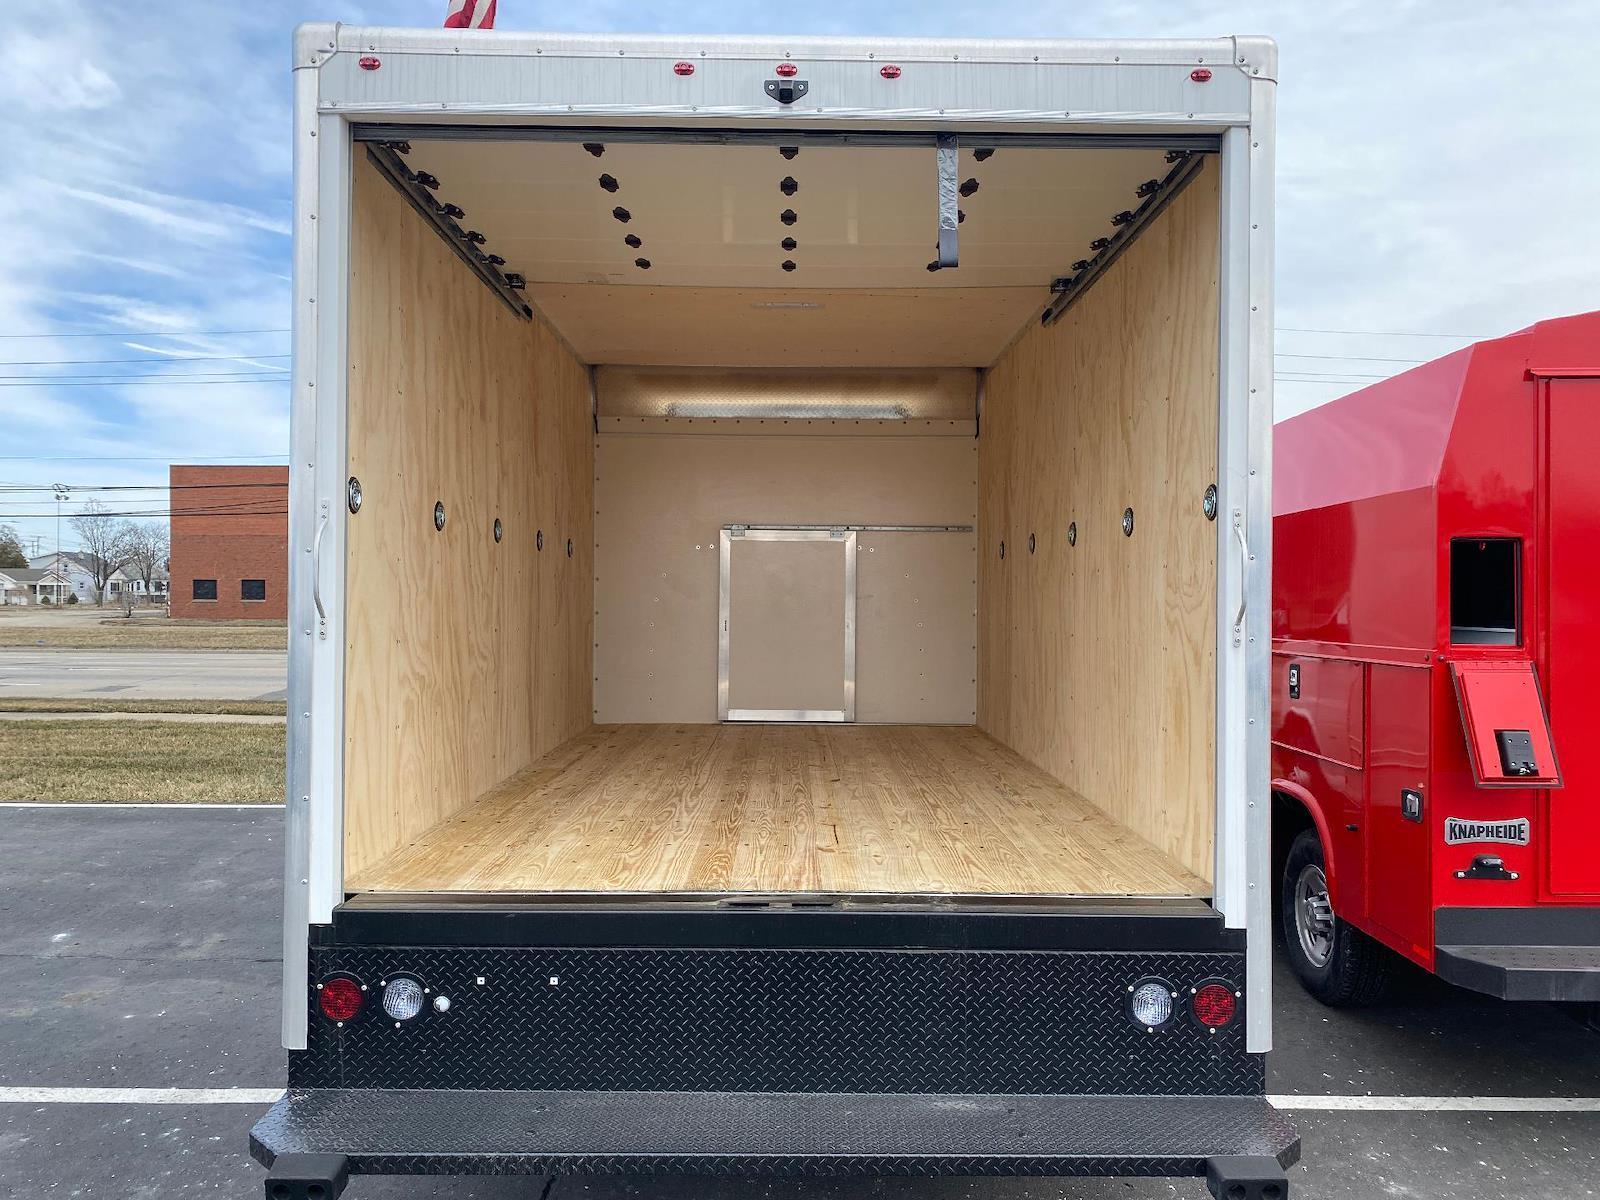 2020 Chevrolet Express 3500 4x2, Cutaway Van #A0369 - photo 4